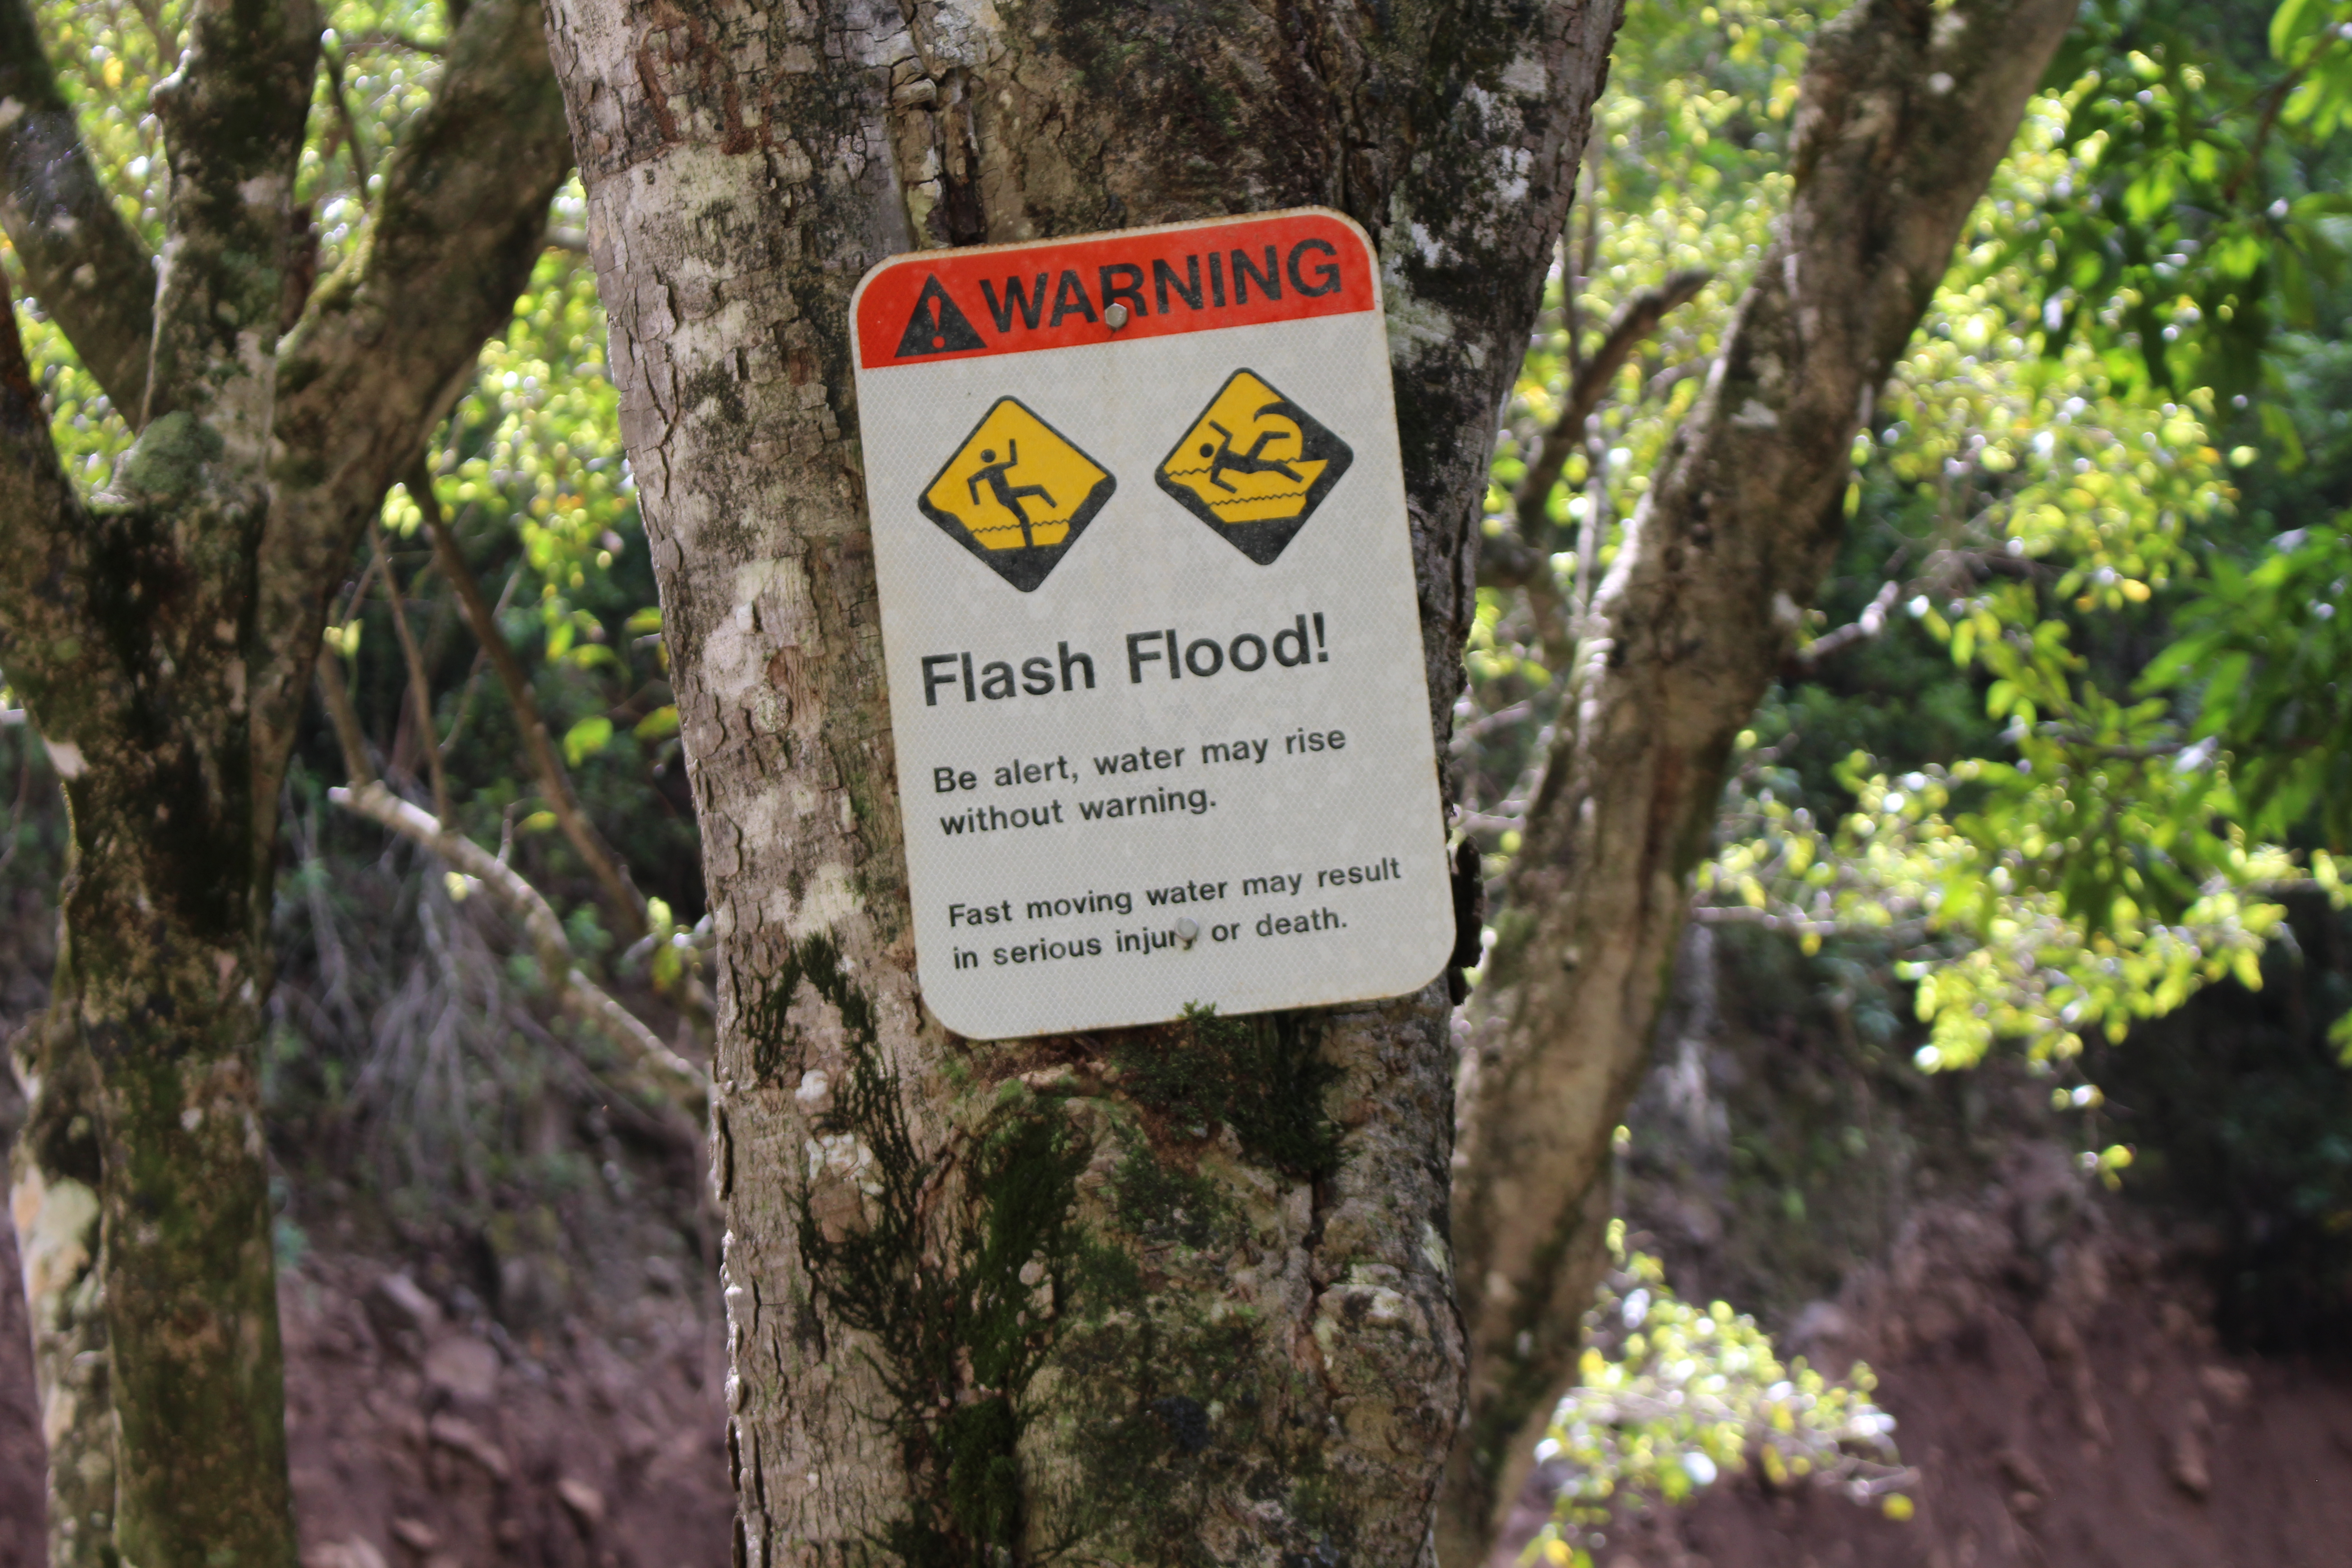 Flash flood warning issued for Kauai